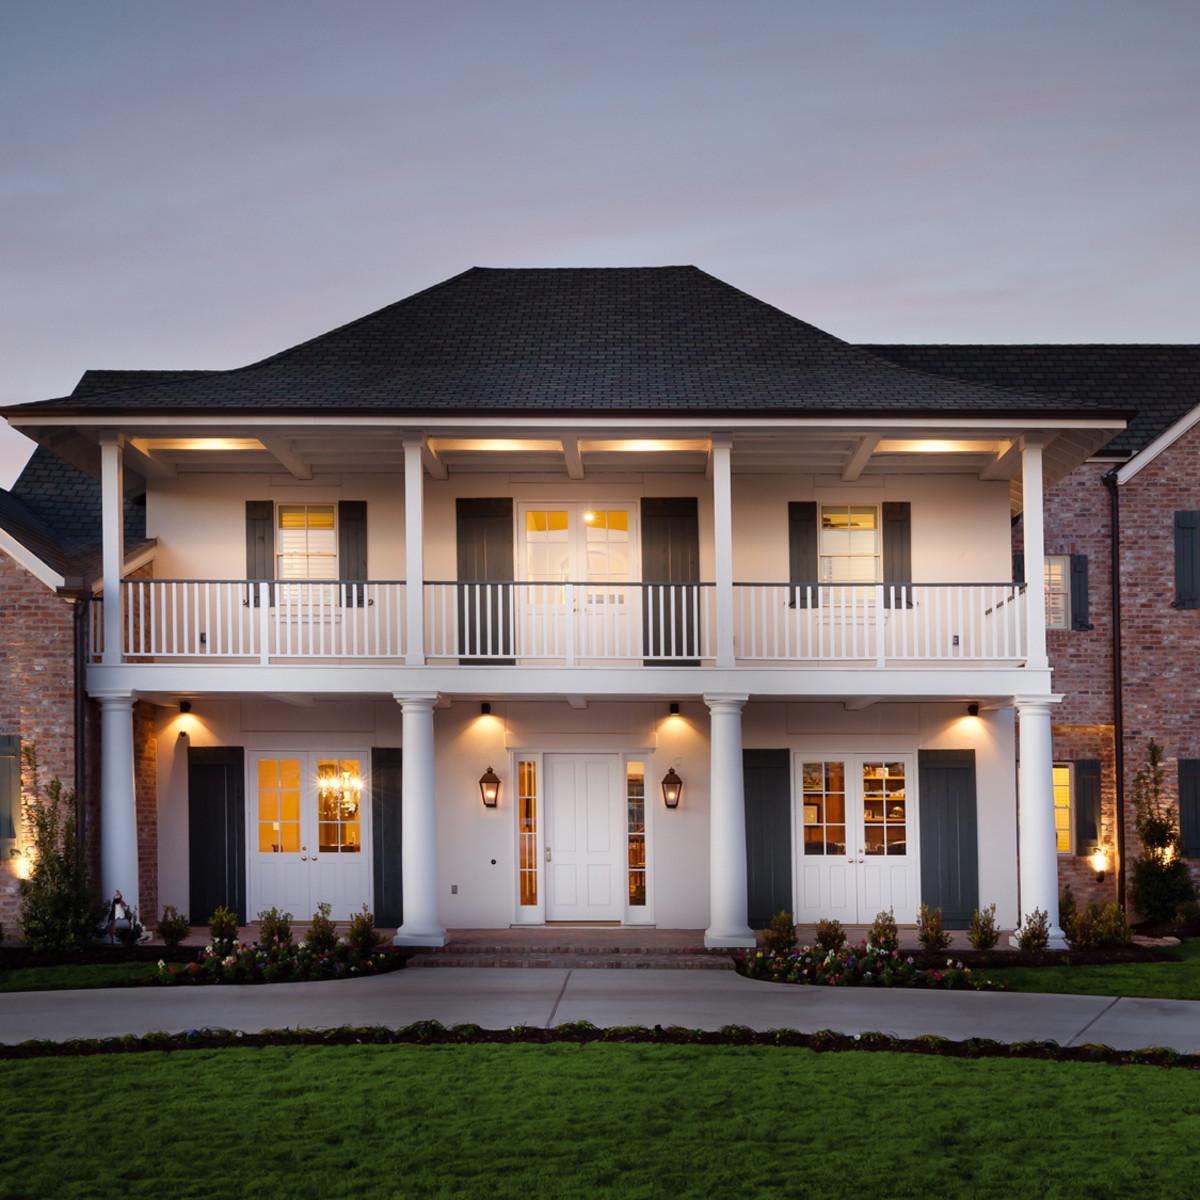 Houston Homebuilder Earns National Honors For Thinking